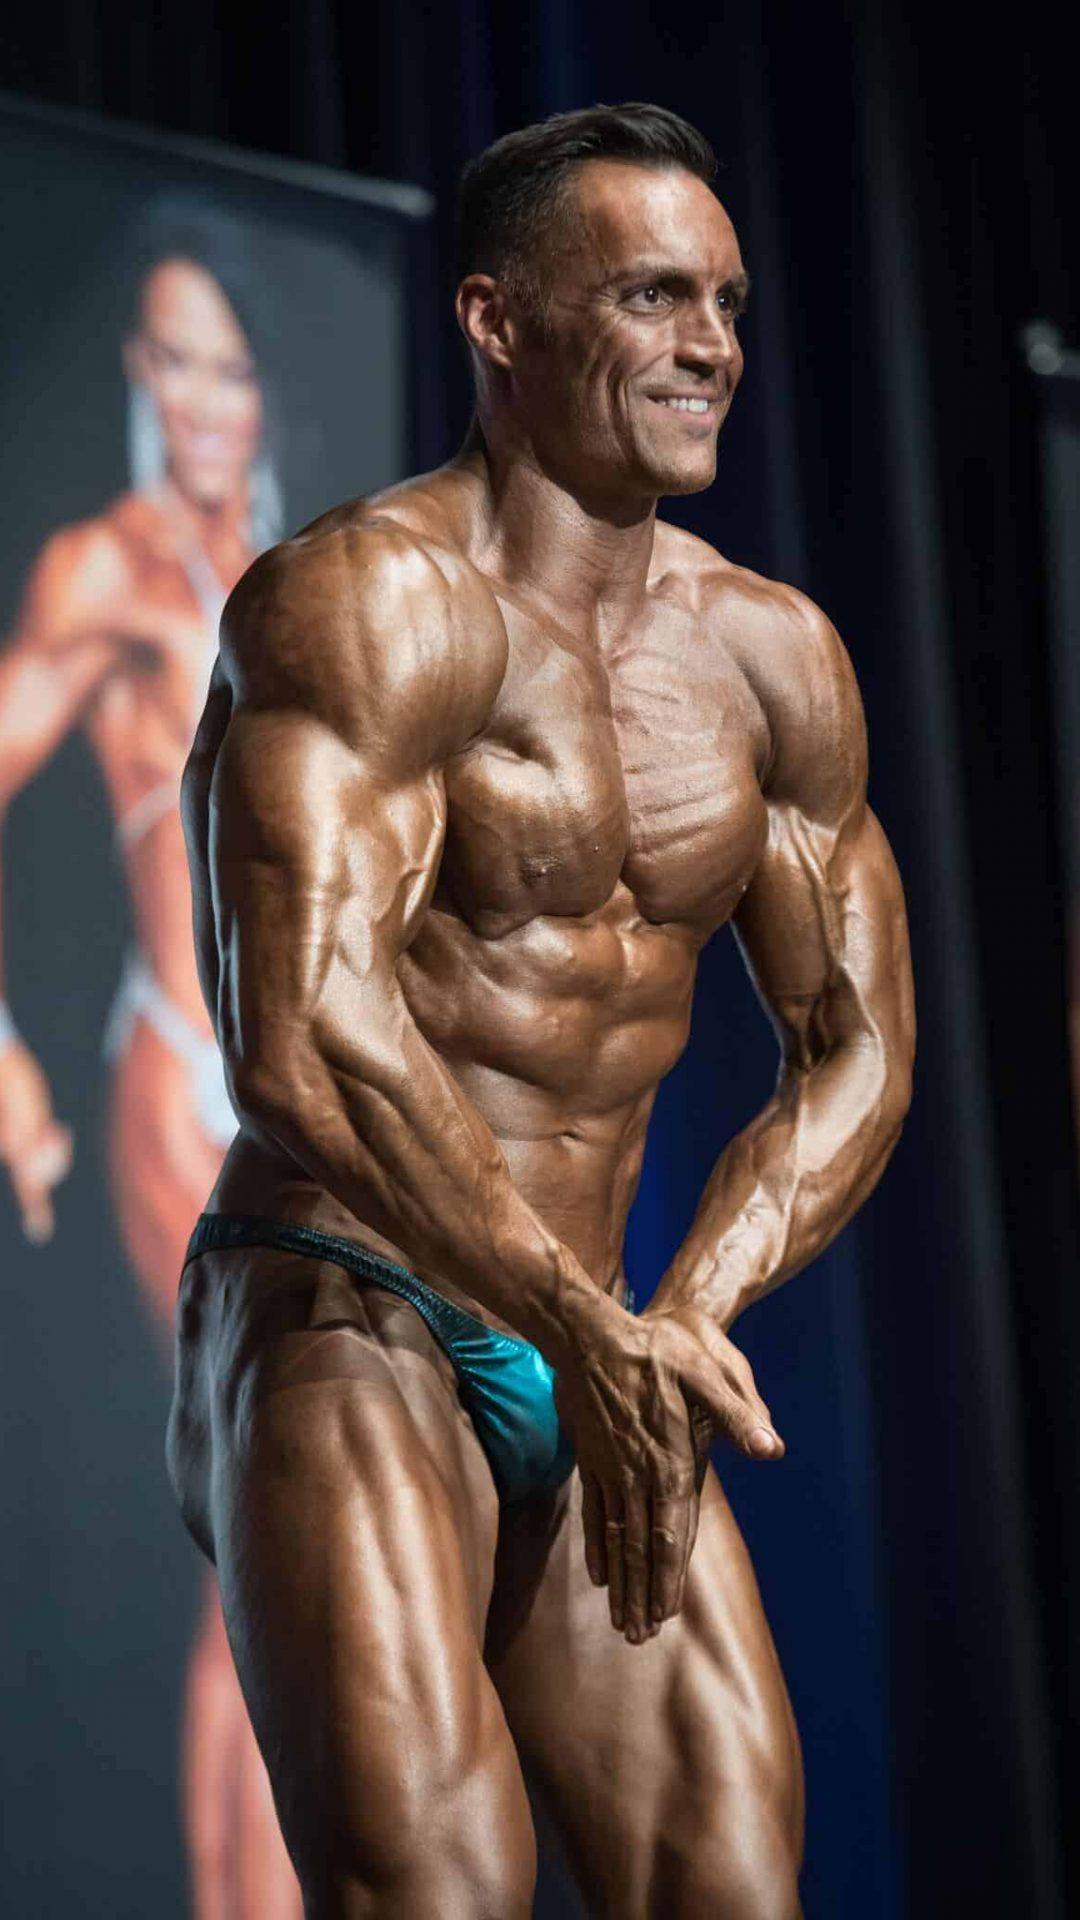 Roberto Amorosi campeonato mundial Los Angeles California culturismo NATURAL